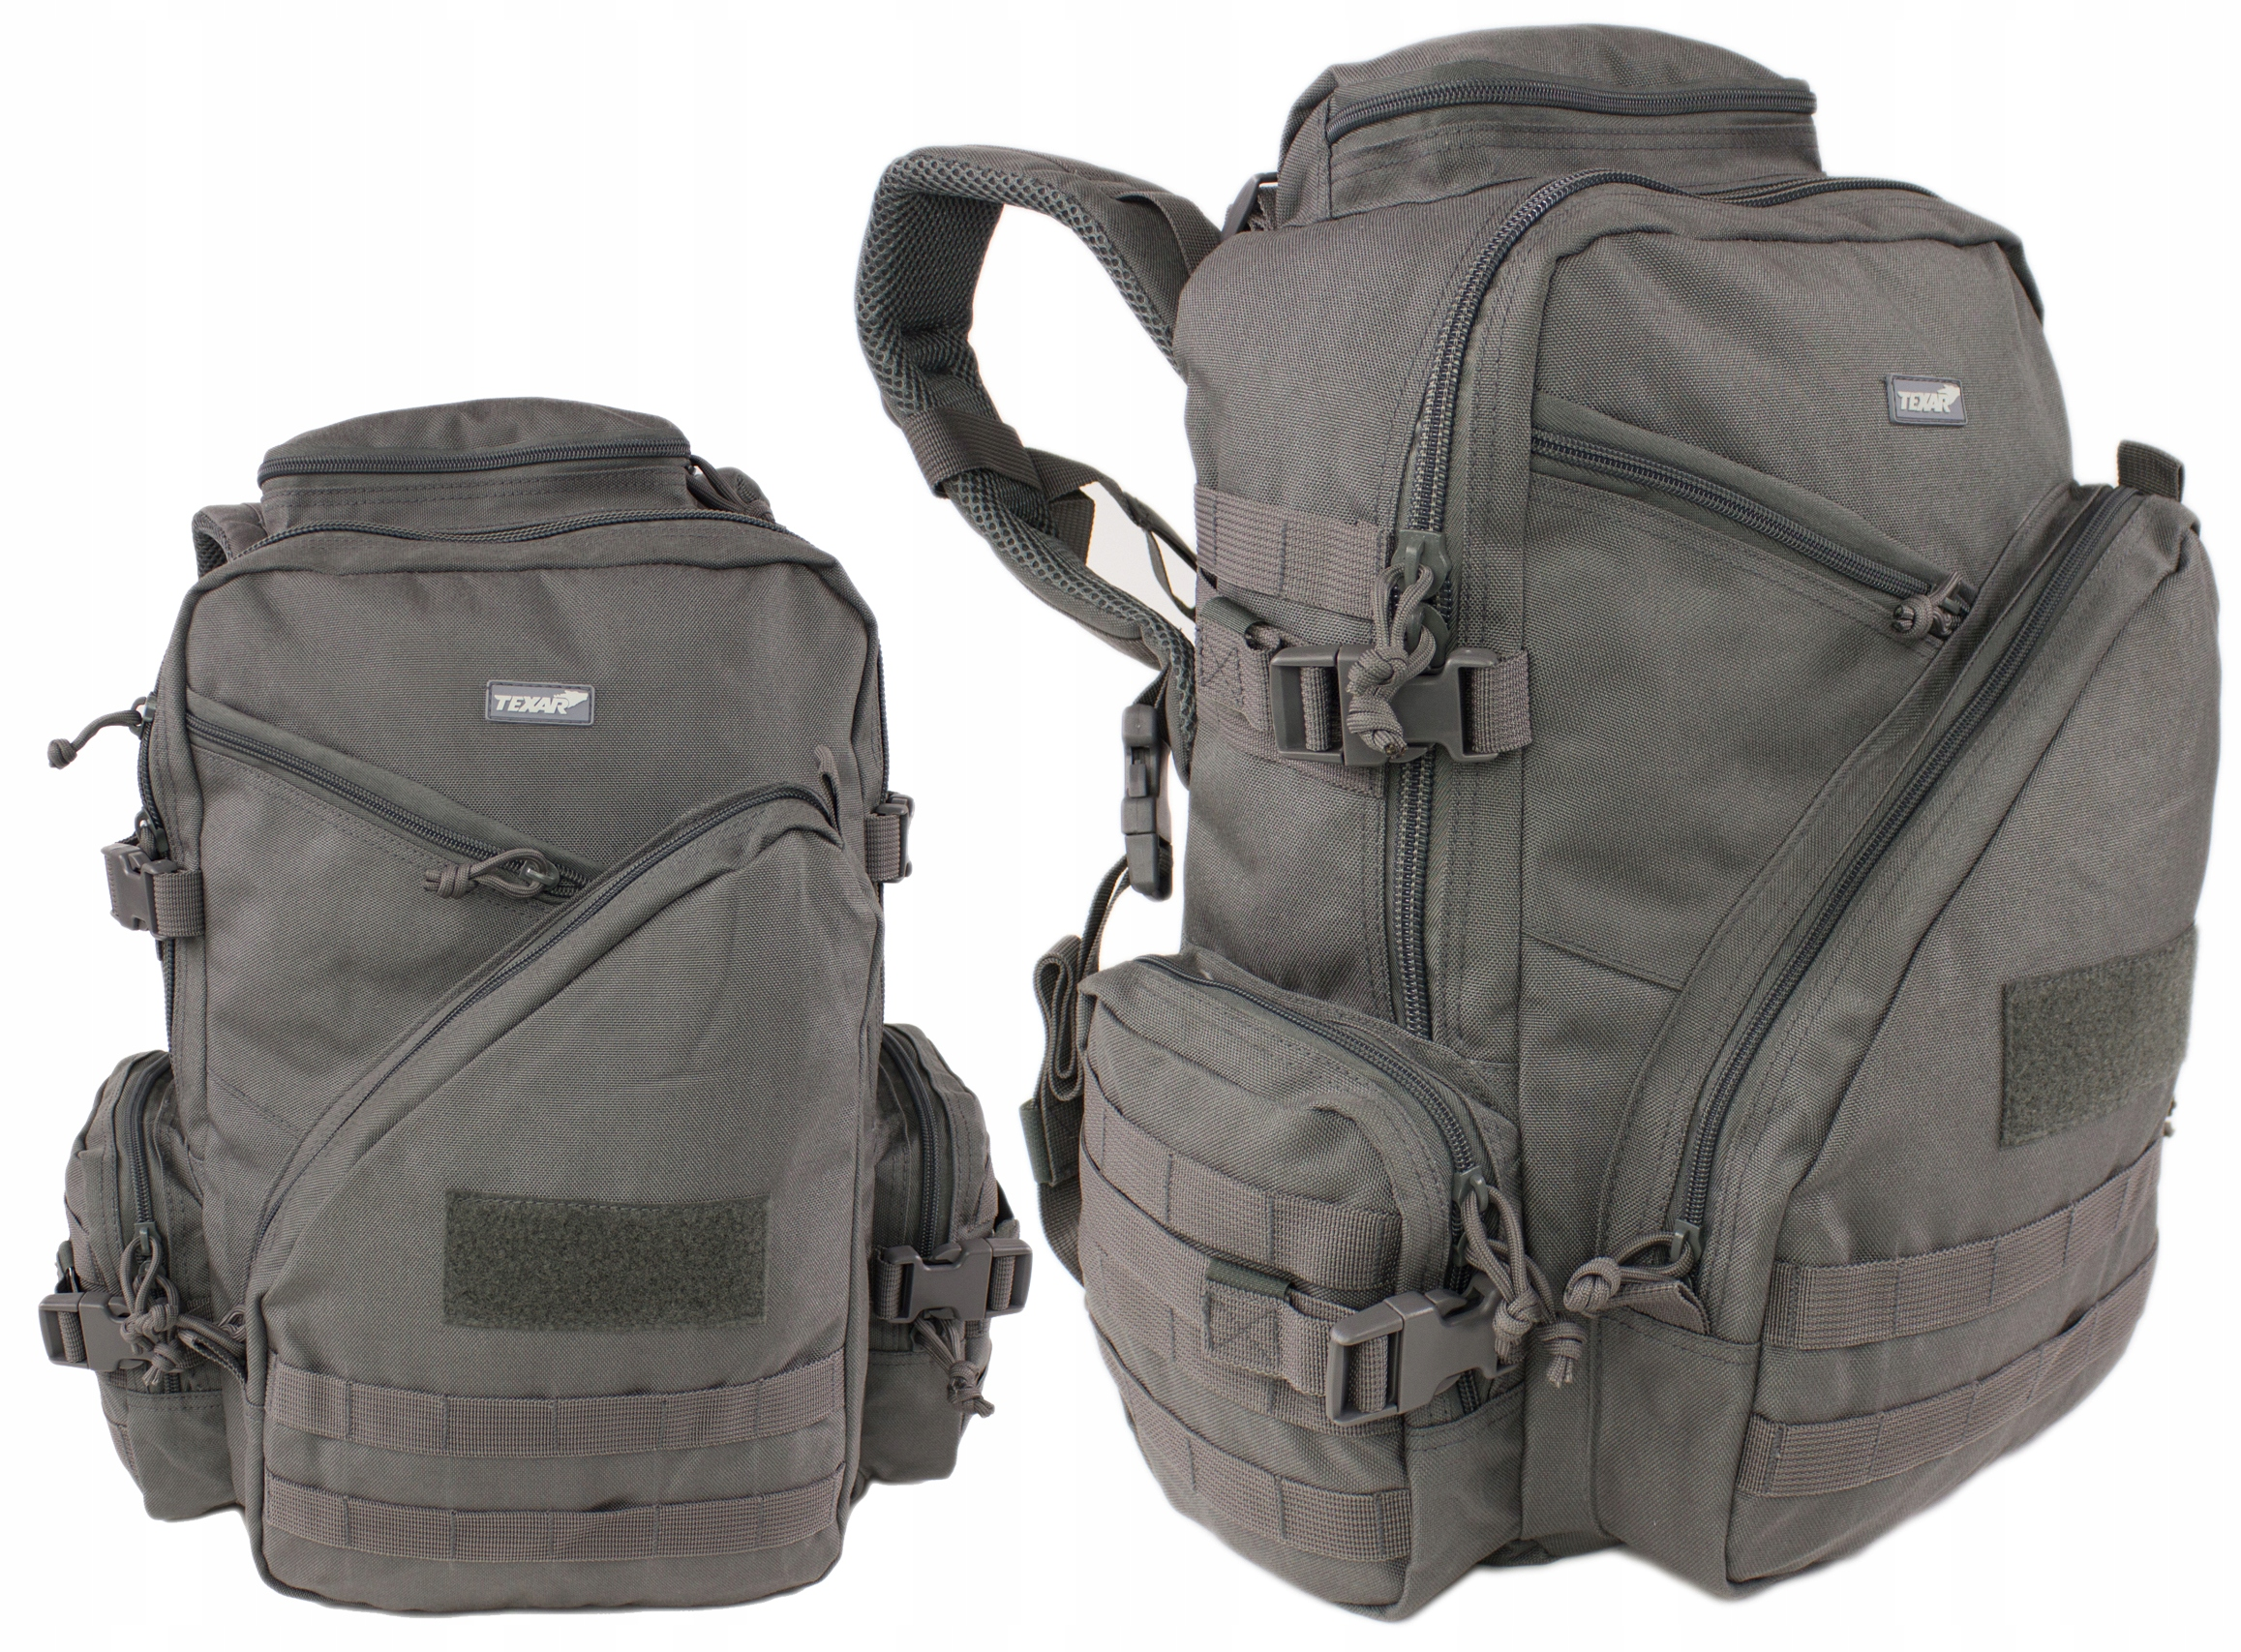 Plecak Wędkarski US Army Texar Urban Szary Grey 33